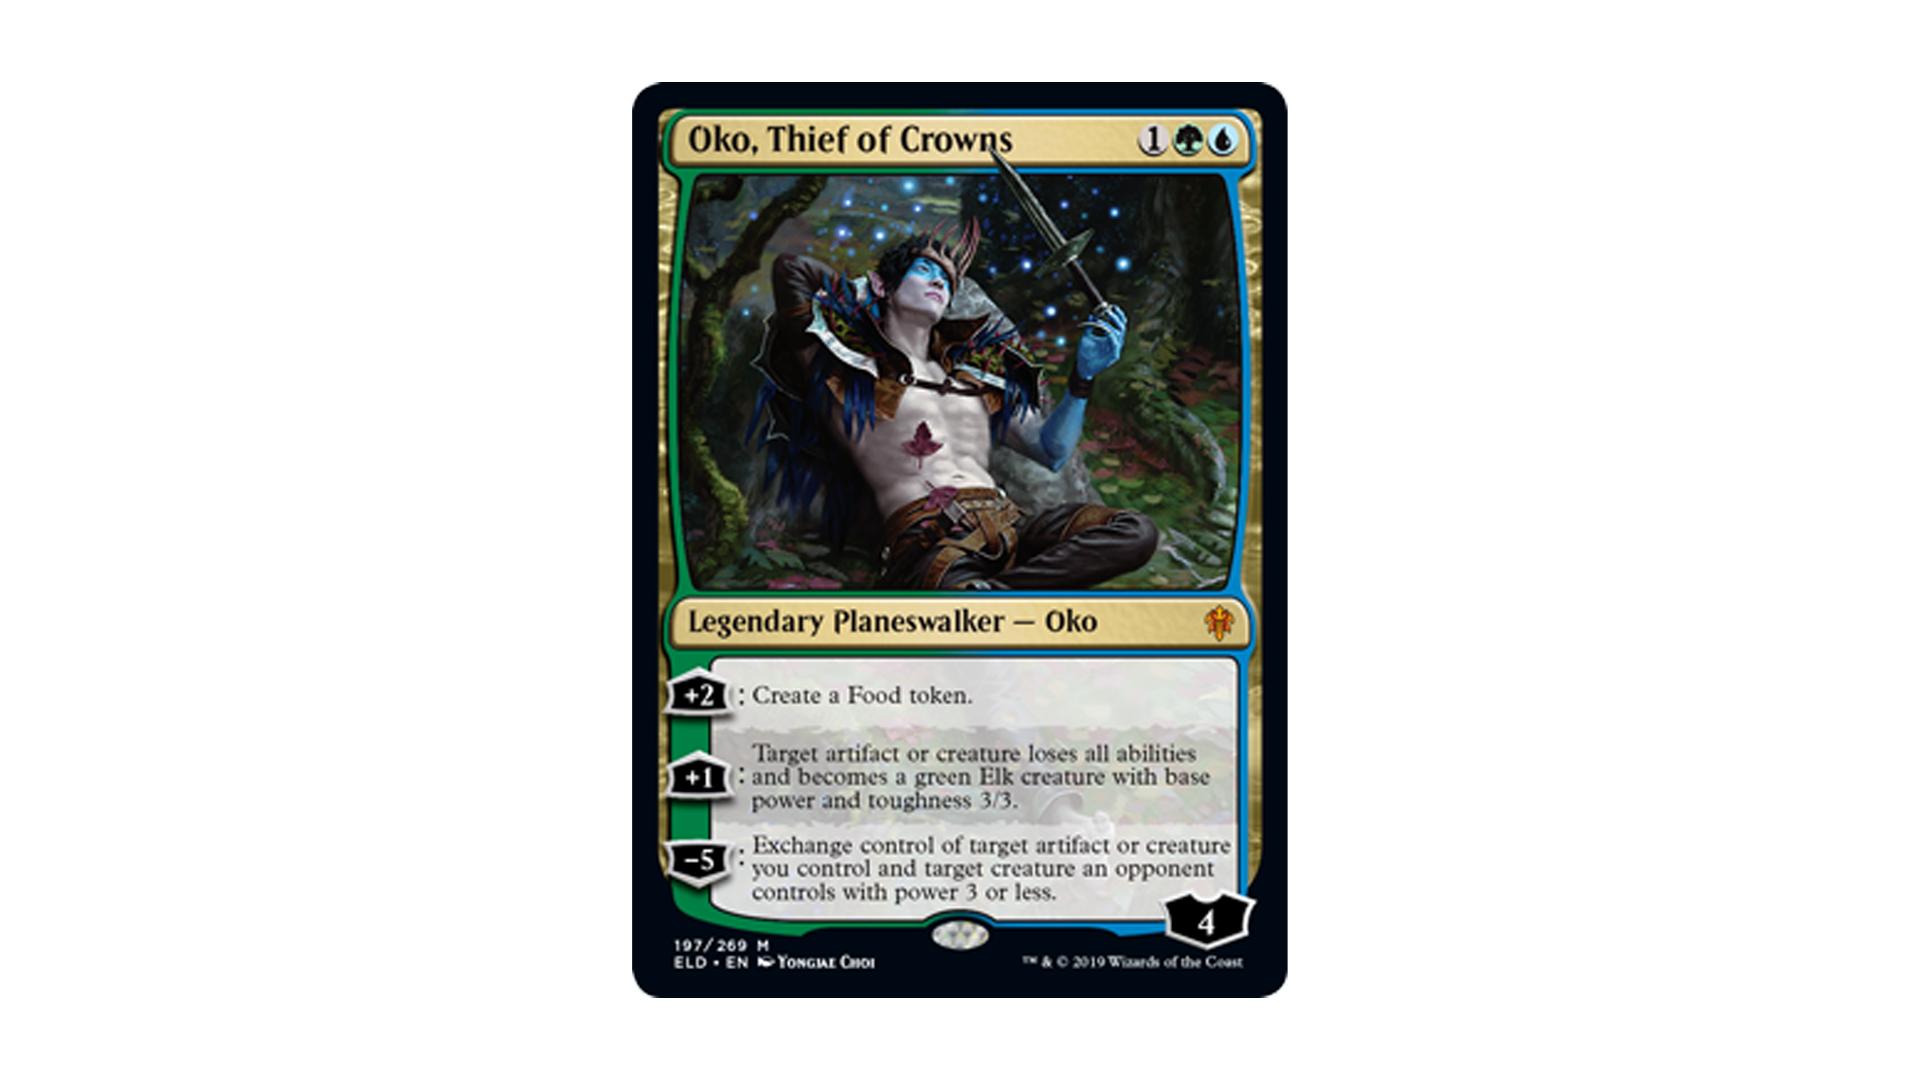 mtg-card-oko-thief-of-crowns.png